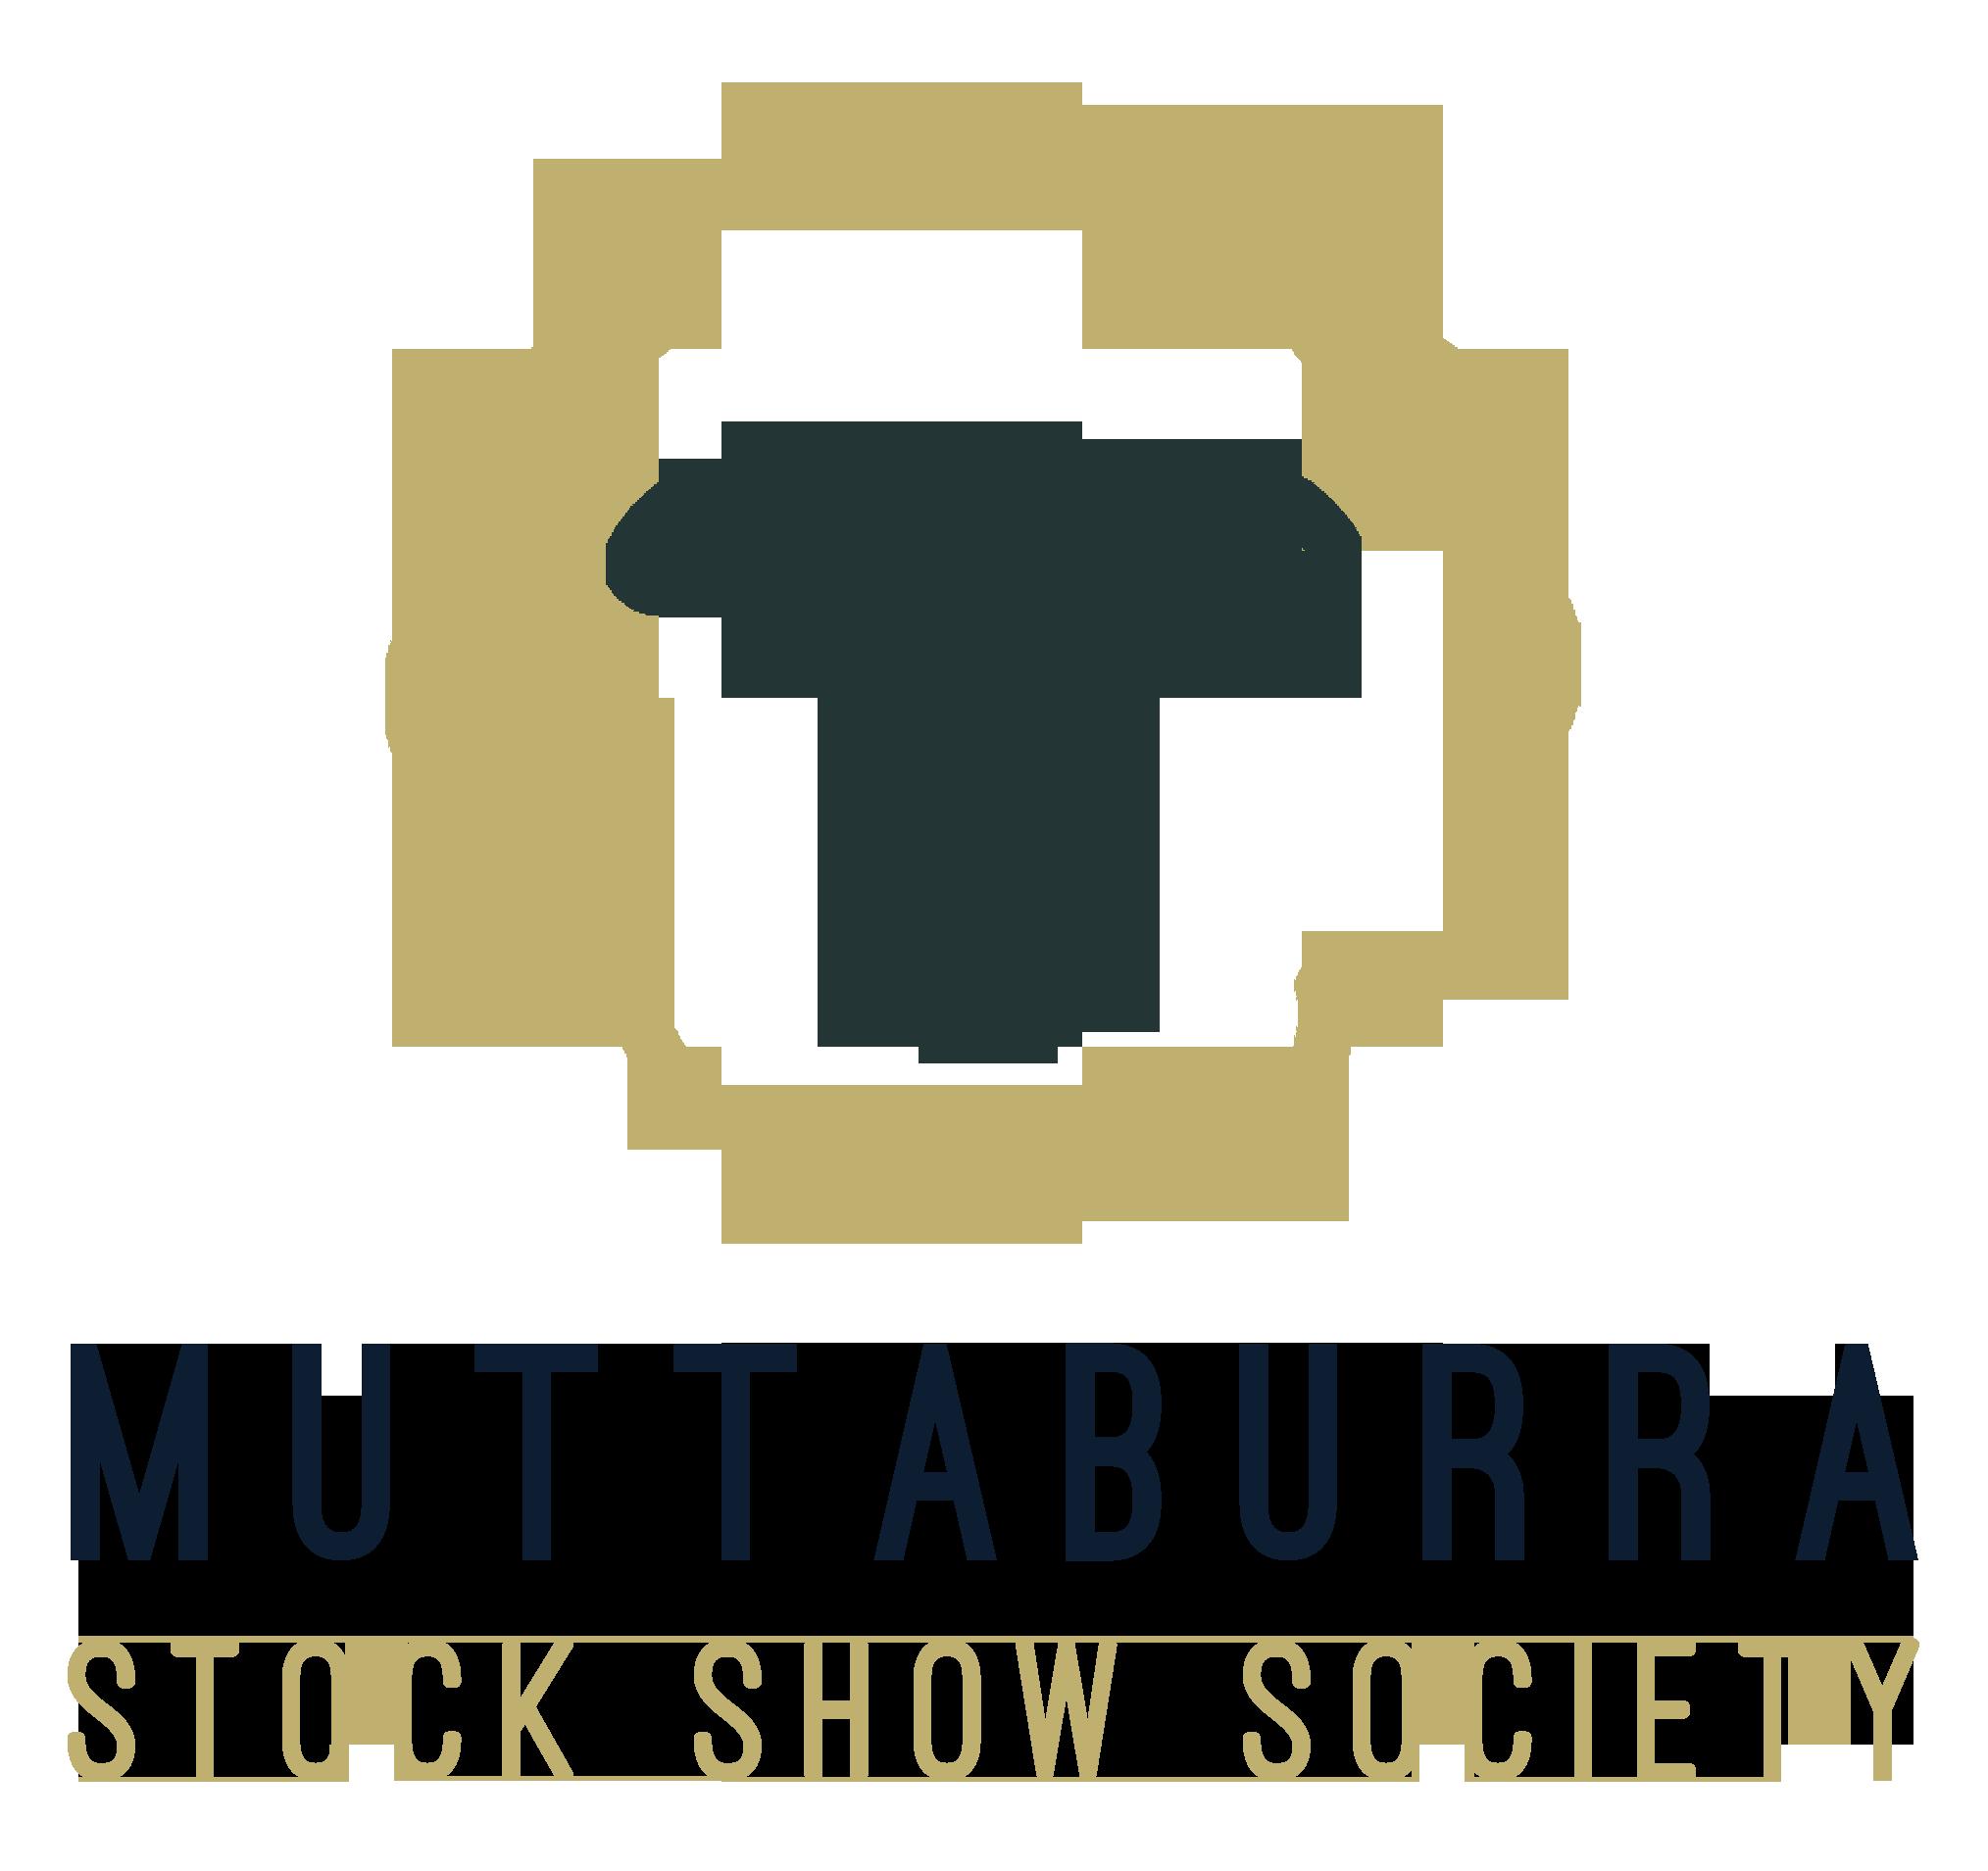 Muttaburra Stock Show Society